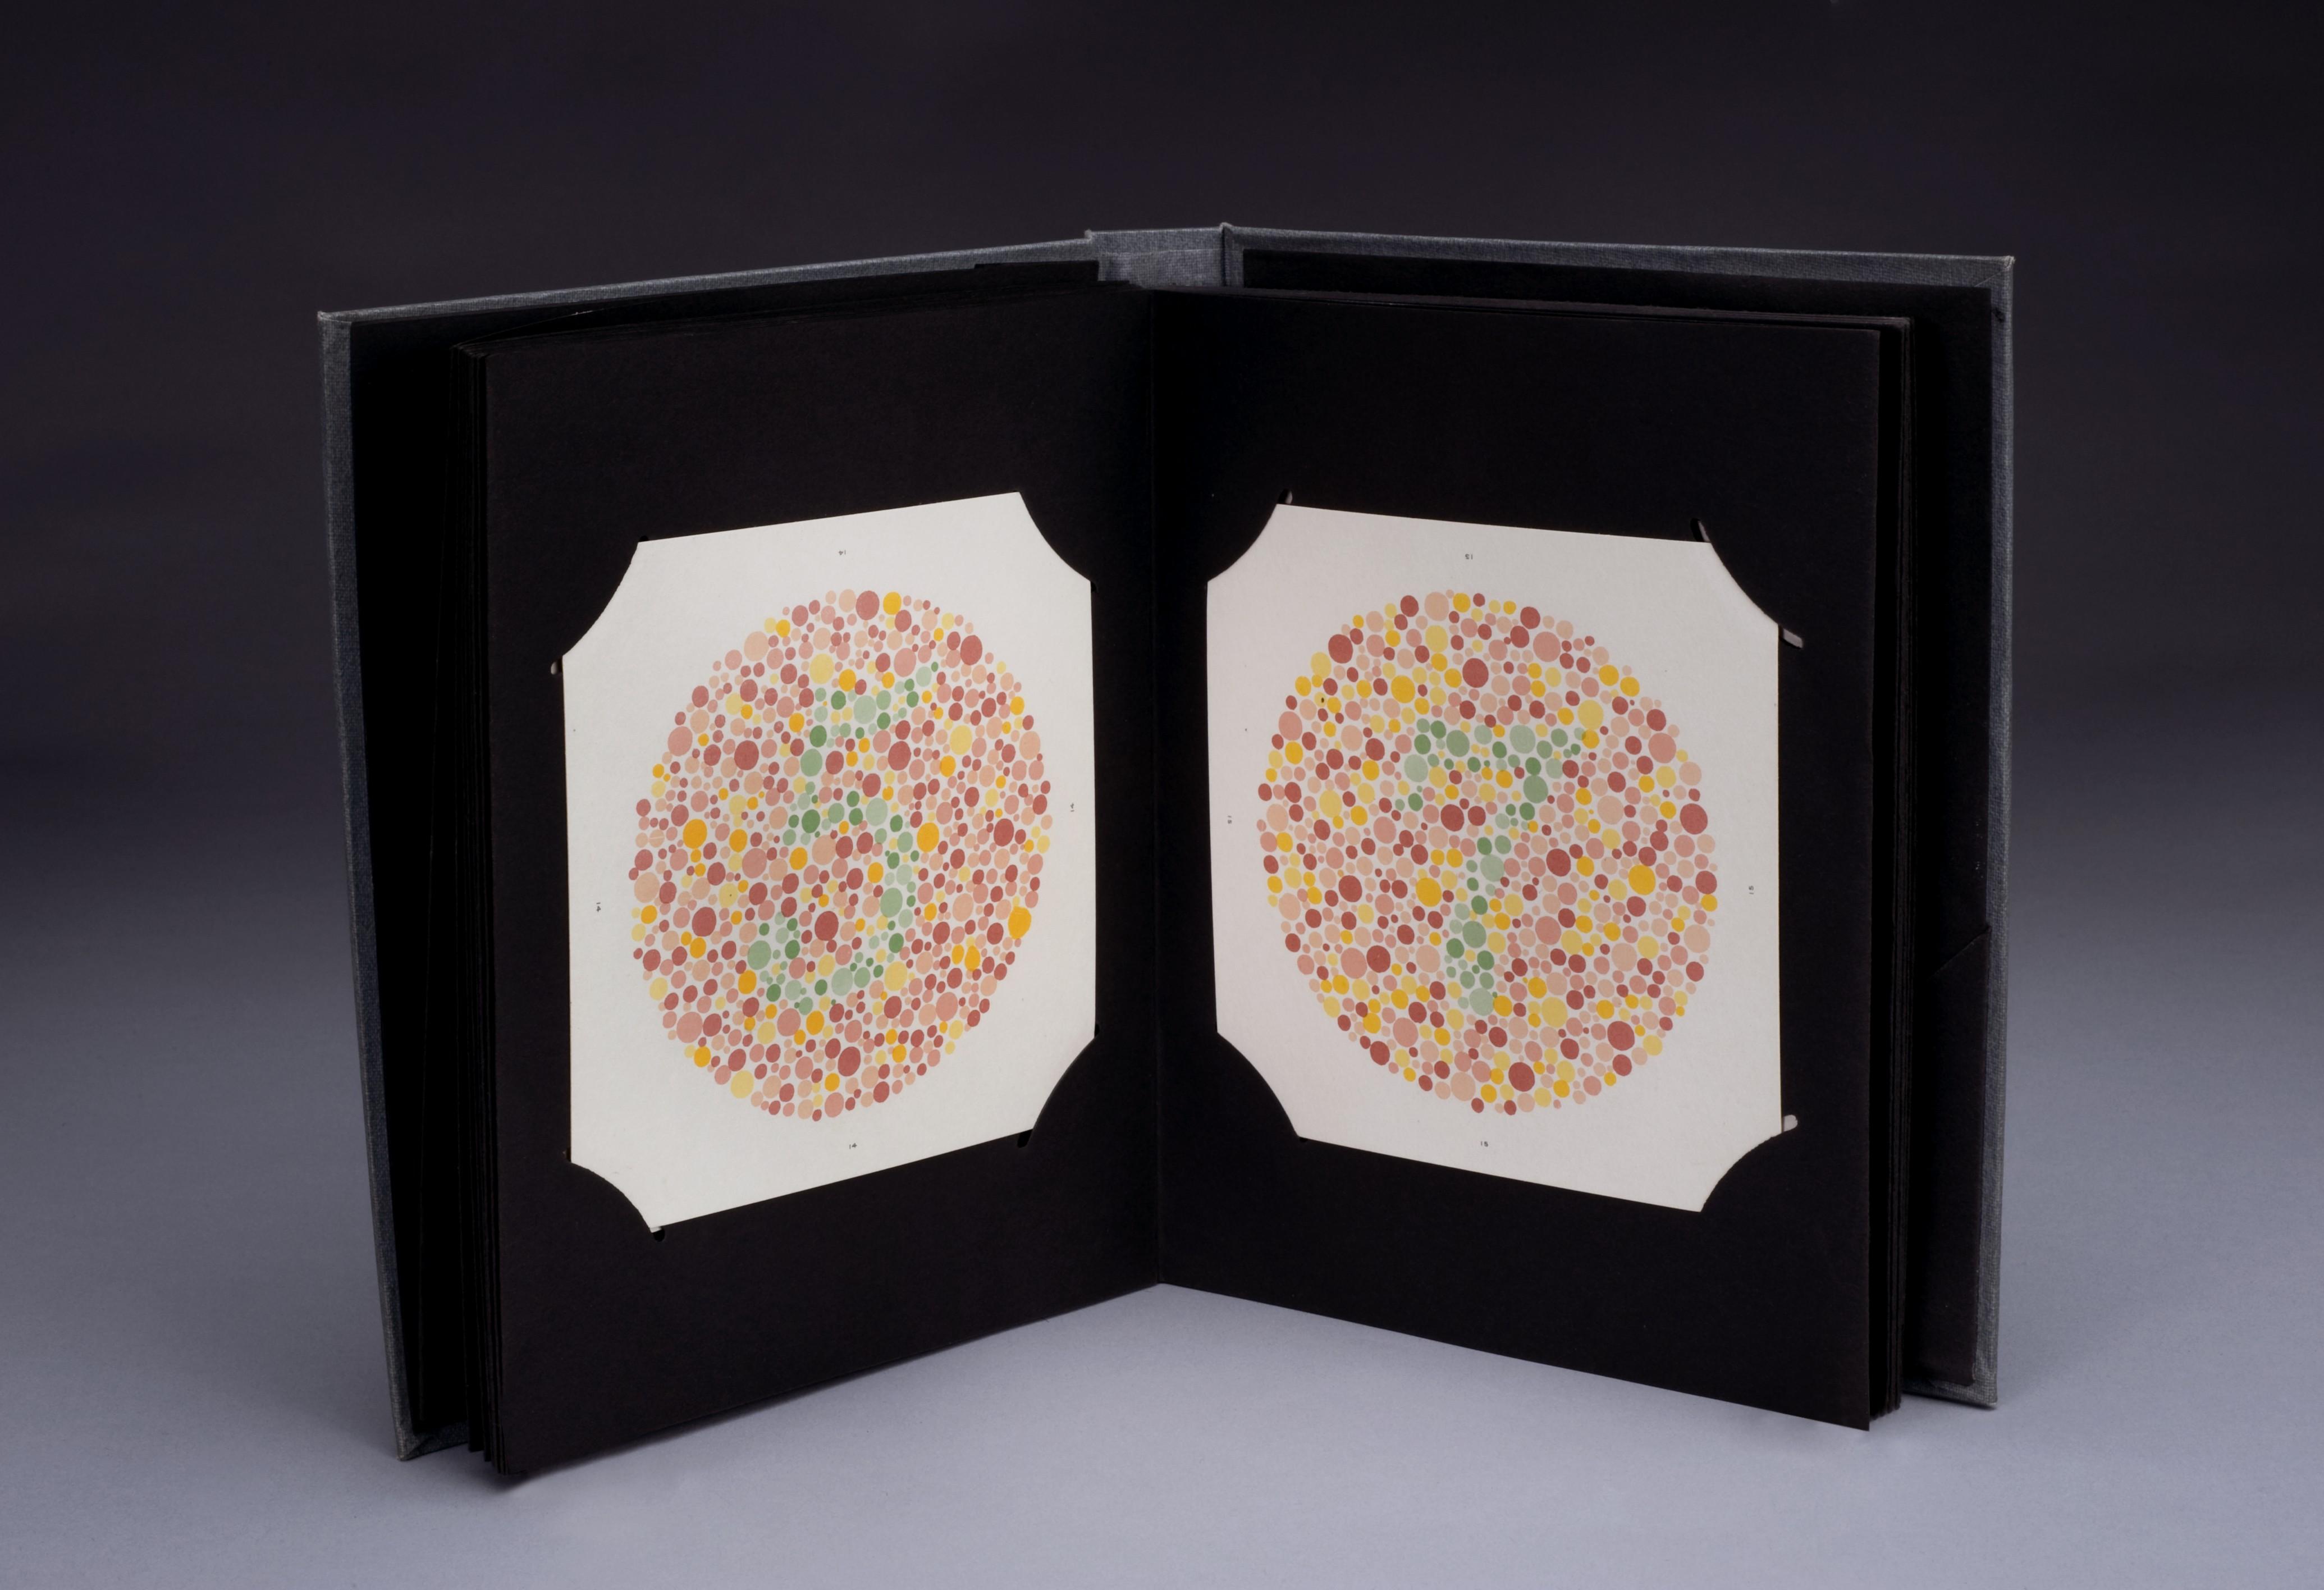 File:Ishihara colour blindness test, London, England, 1948 ...